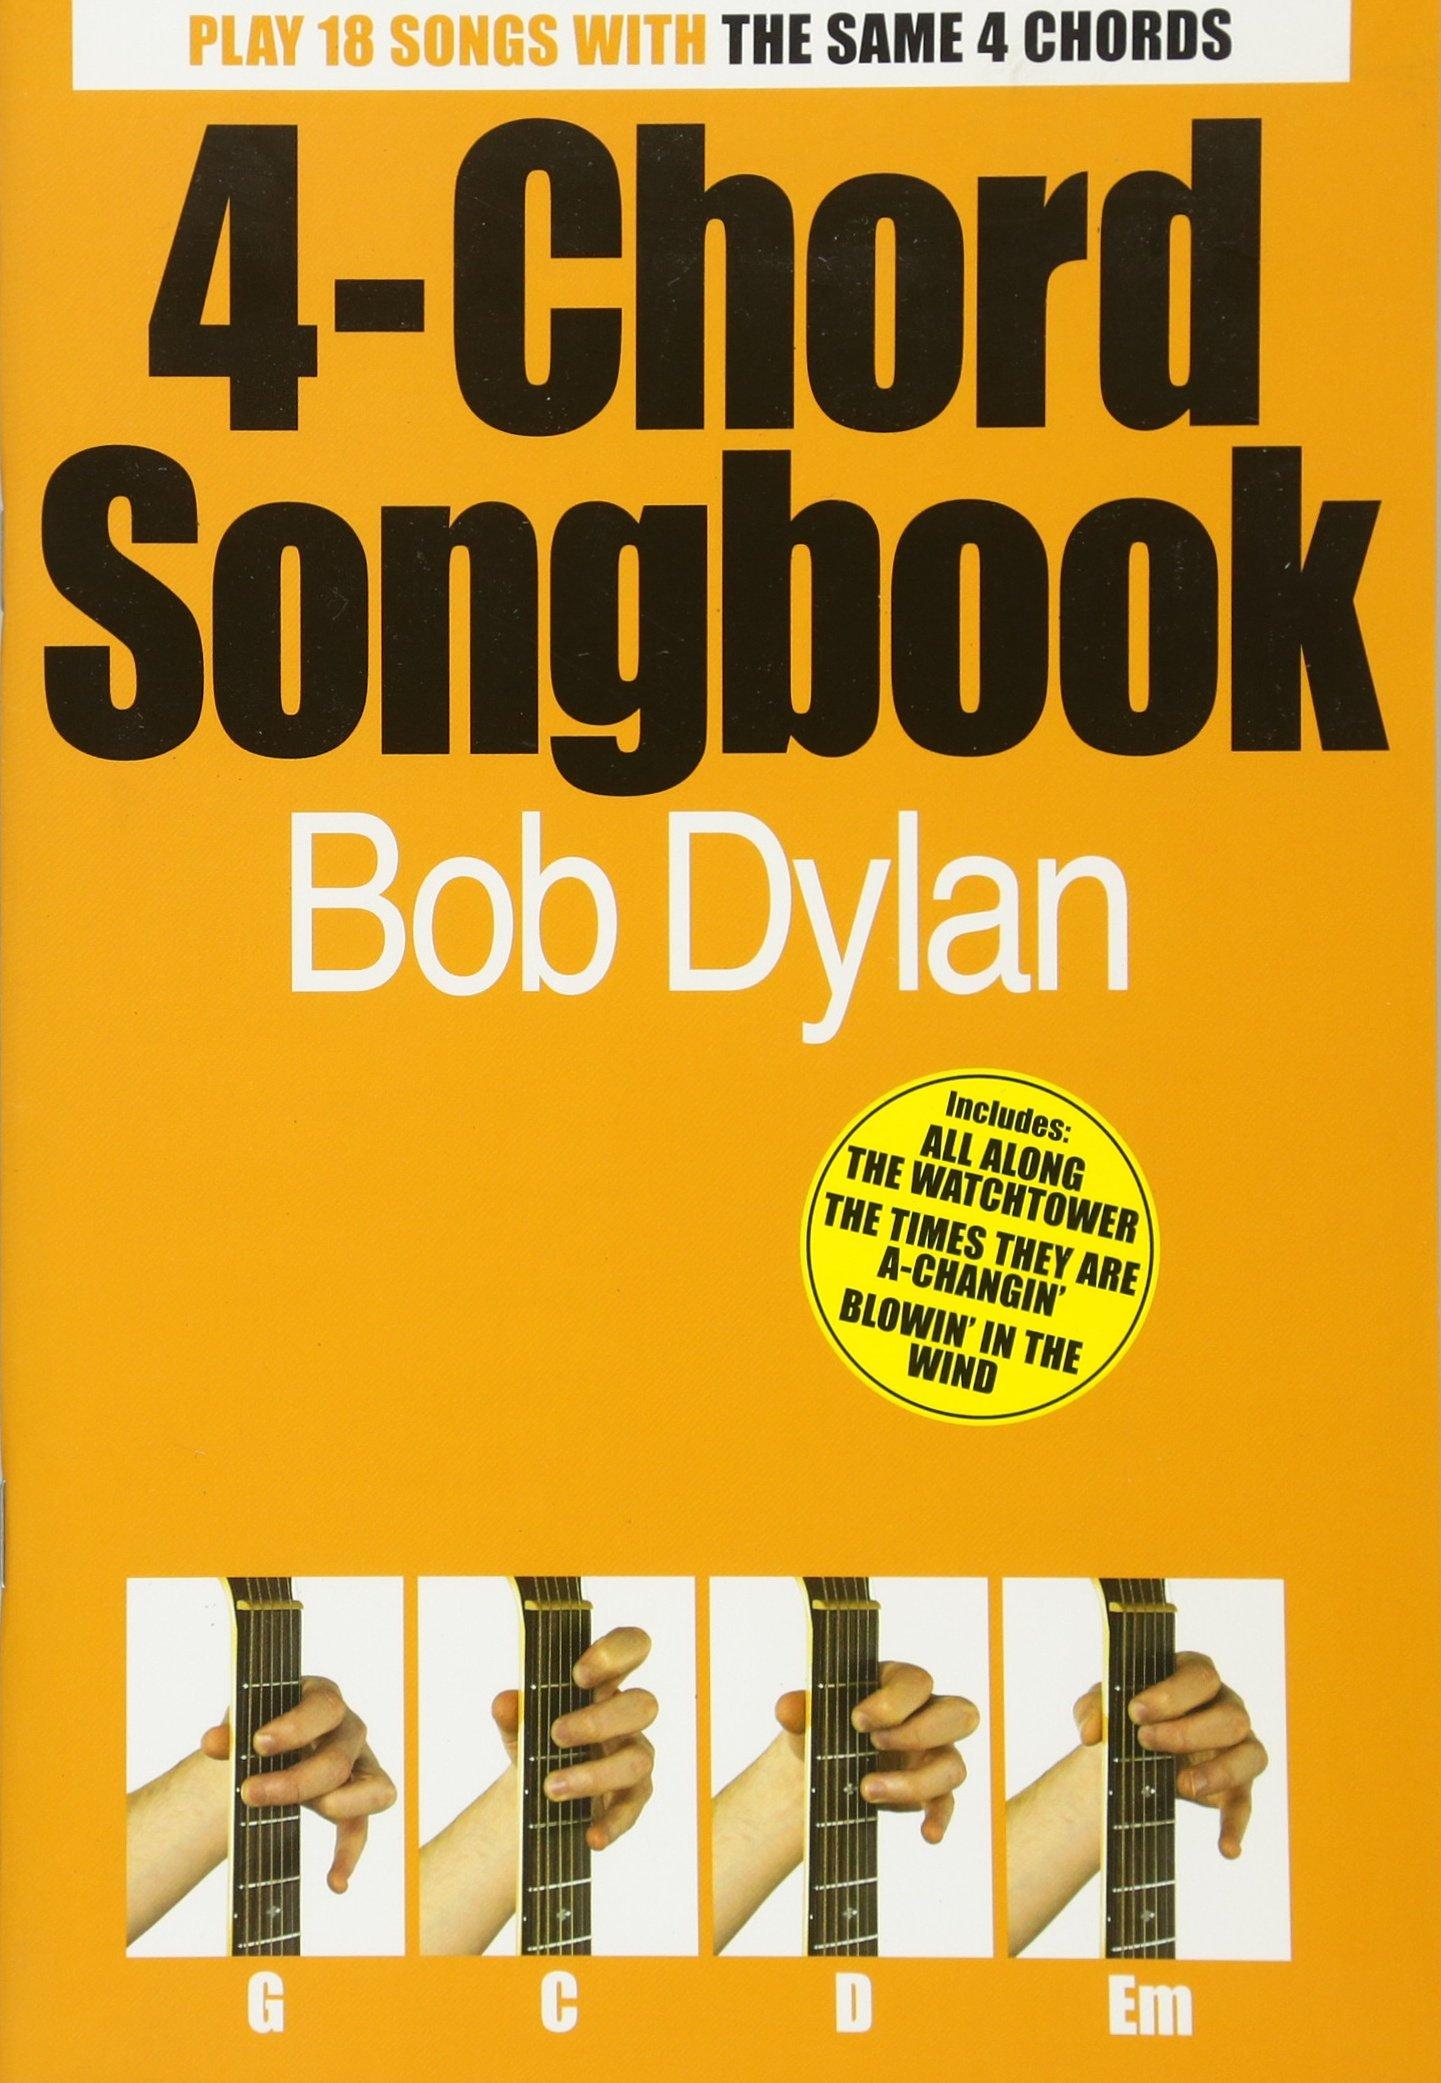 Bob dylan 4 chord songbook amazon bob artist dylan bob dylan 4 chord songbook amazon bob artist dylan 9781846098208 books hexwebz Images